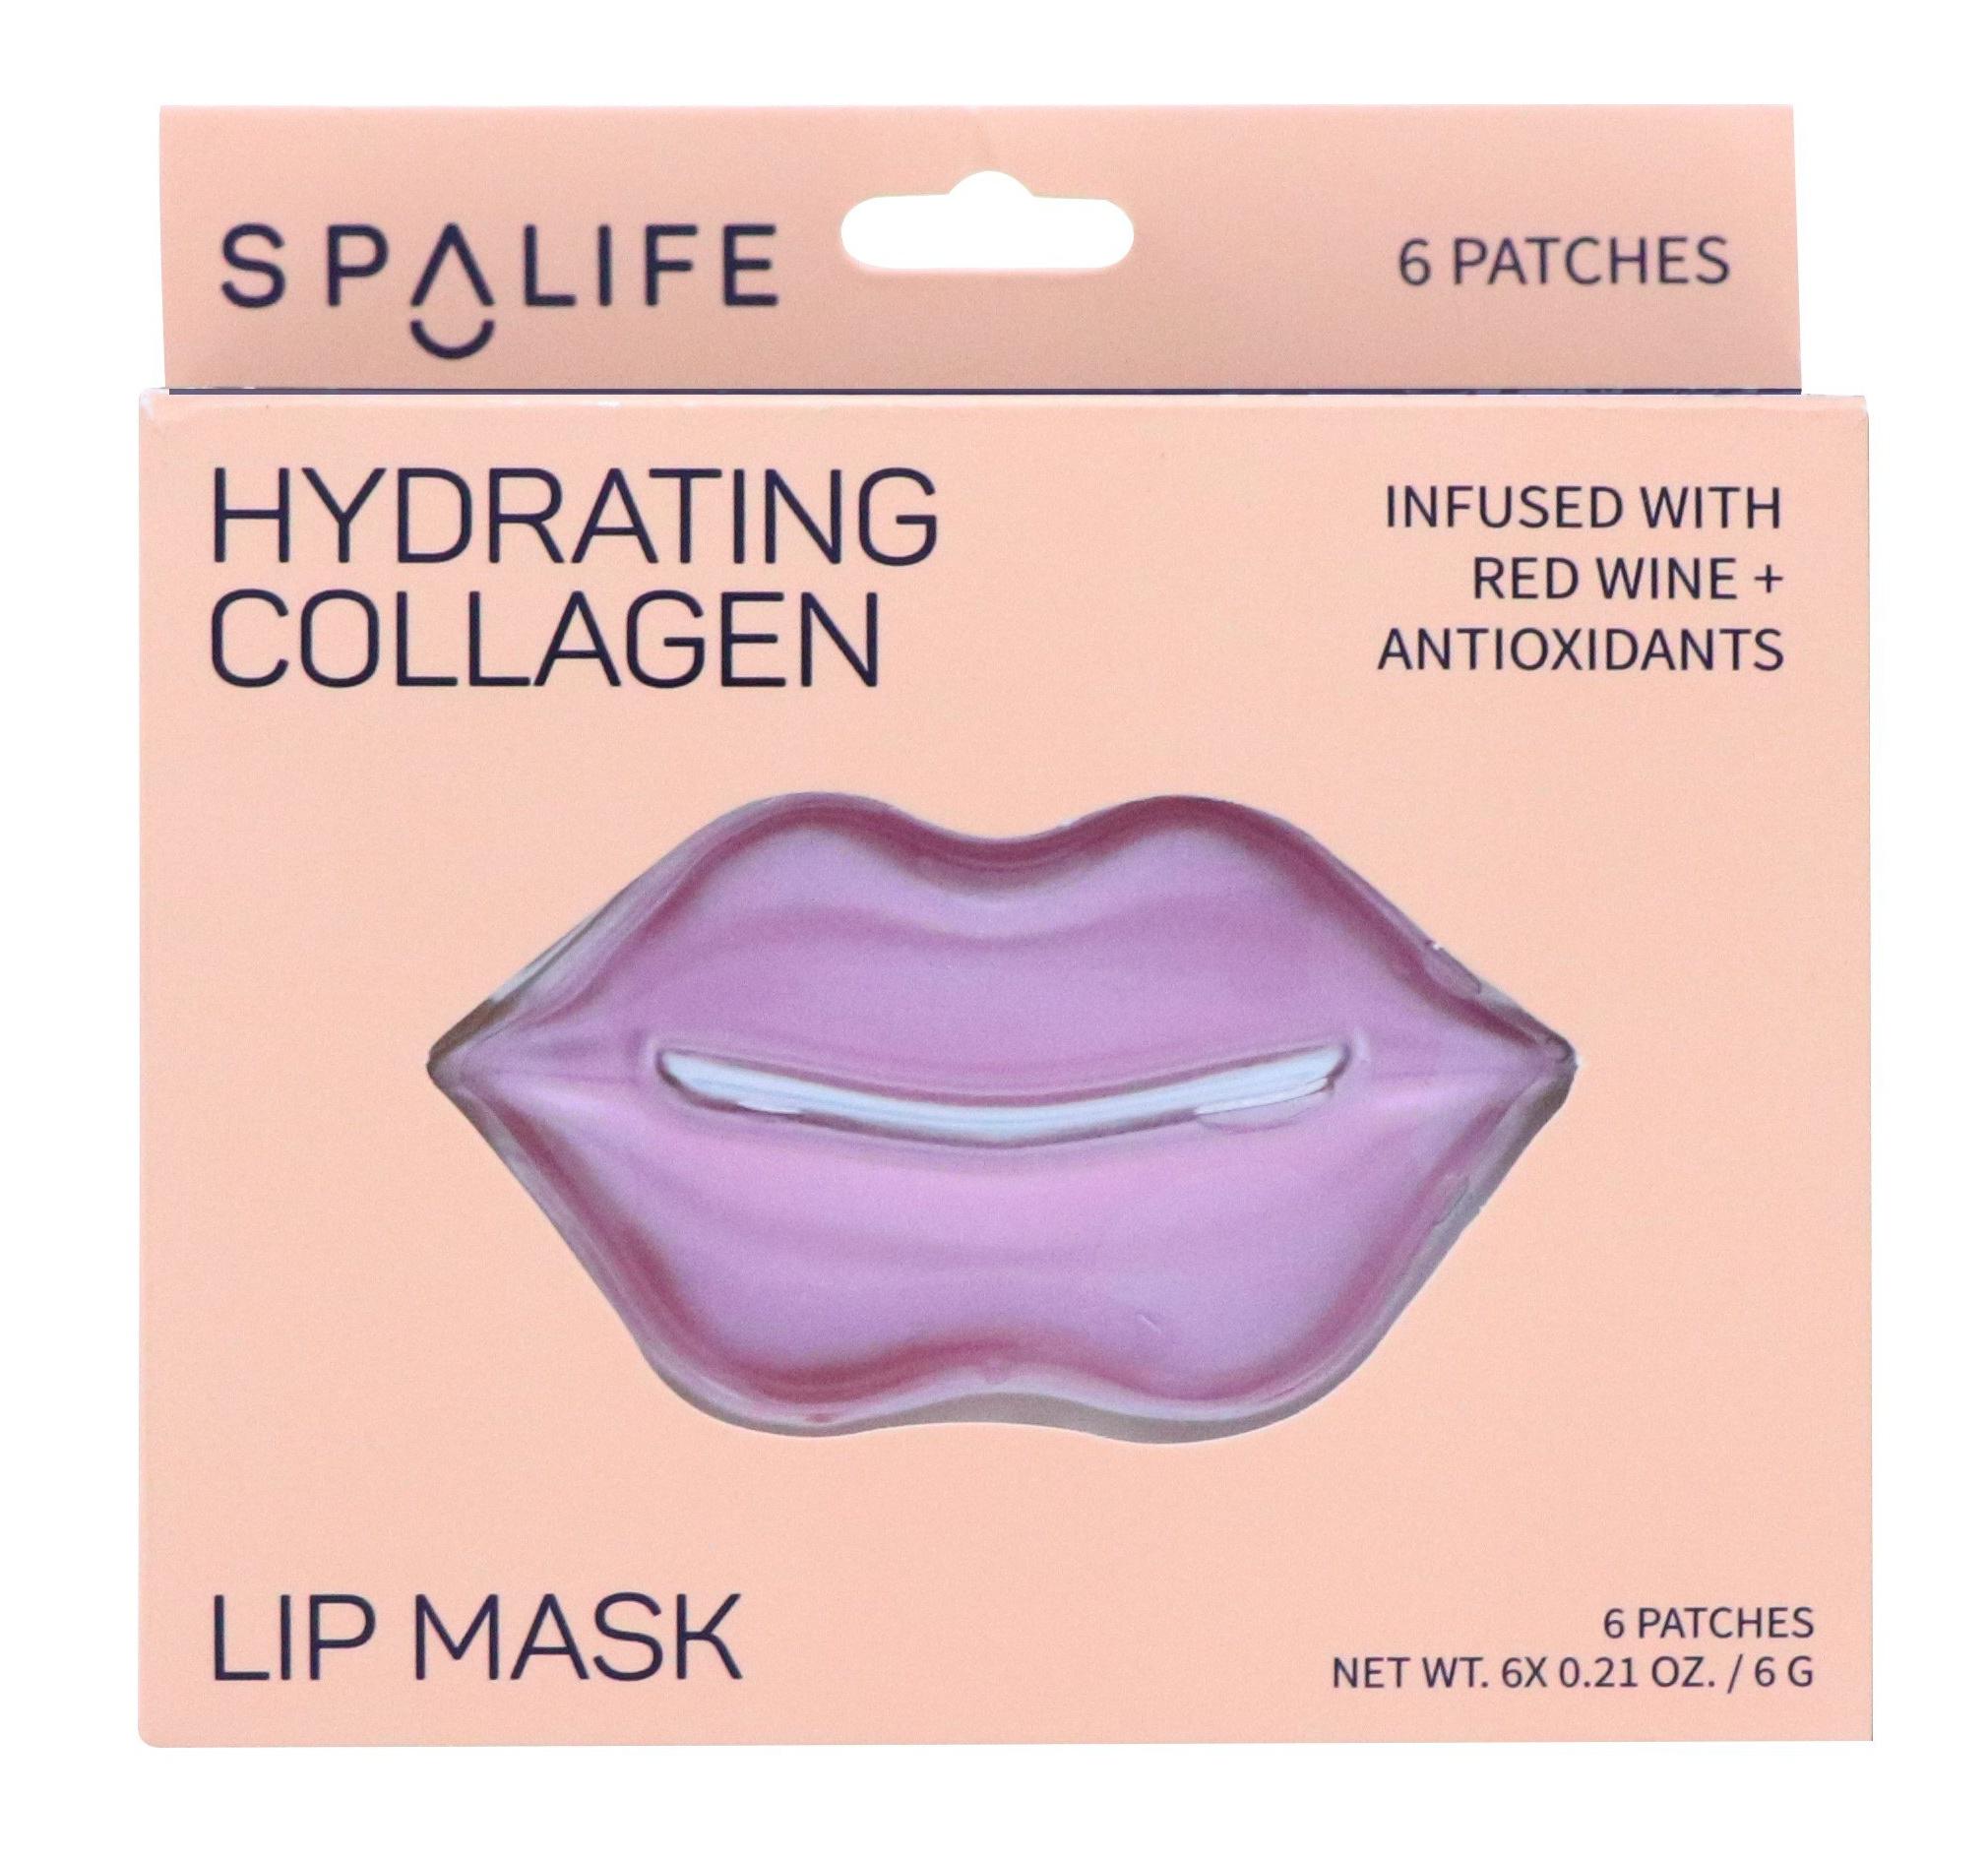 Spalife Hydrating collagen lip mask